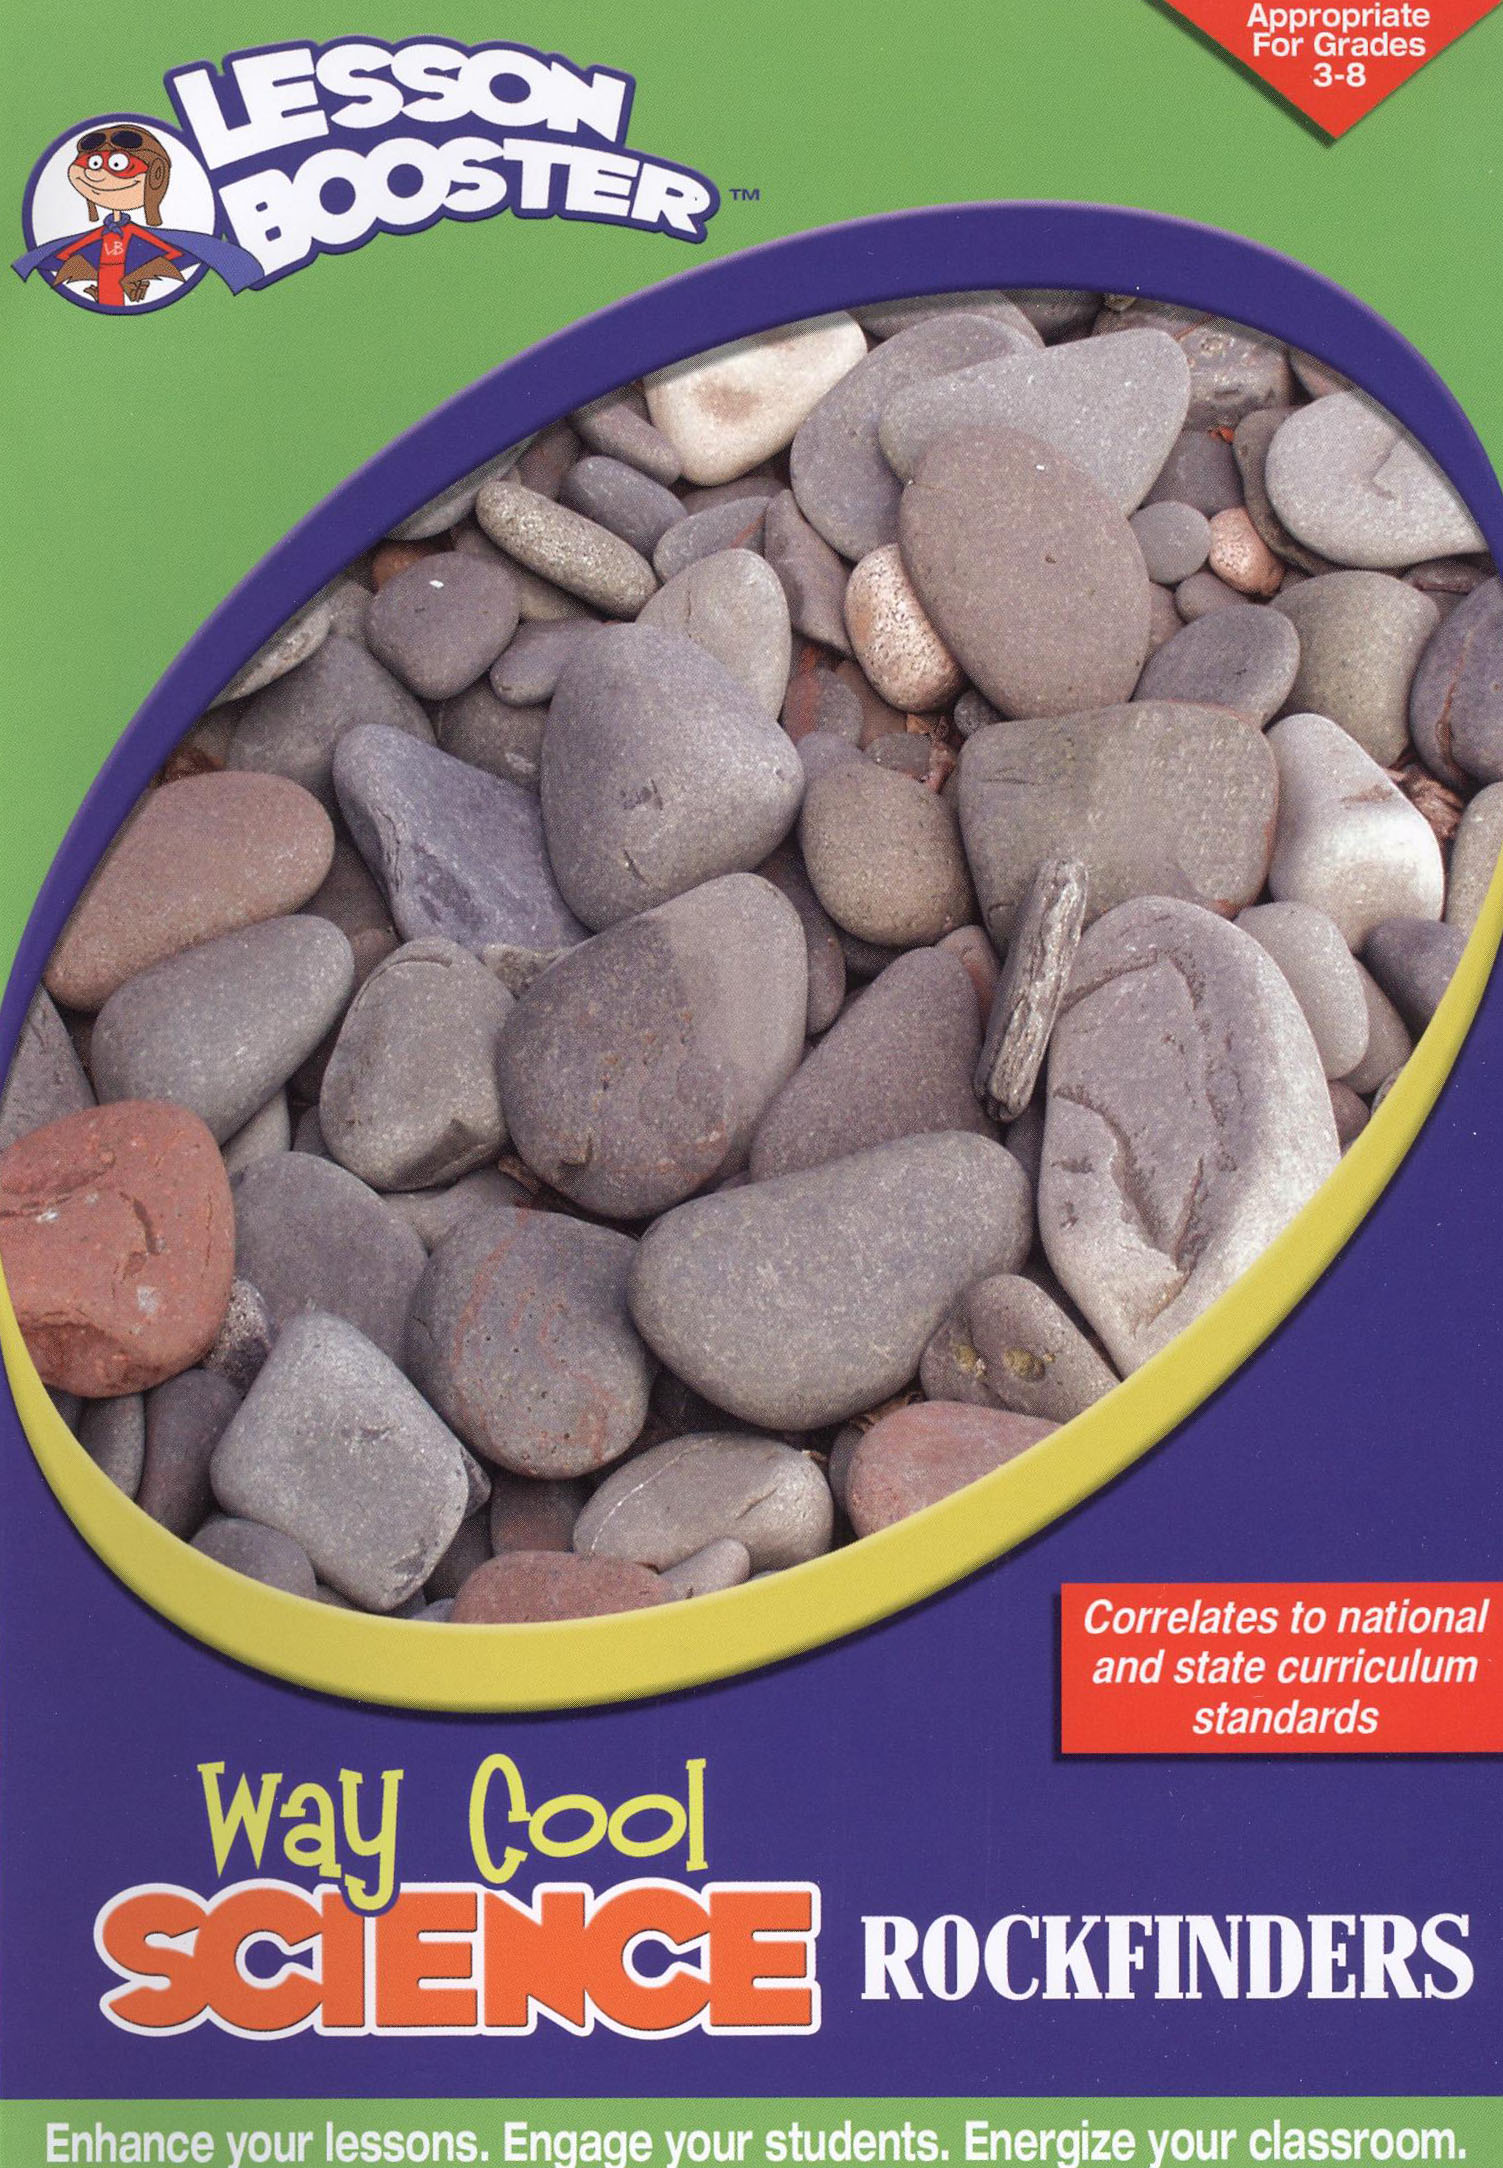 Way Cool Science: RockFinders